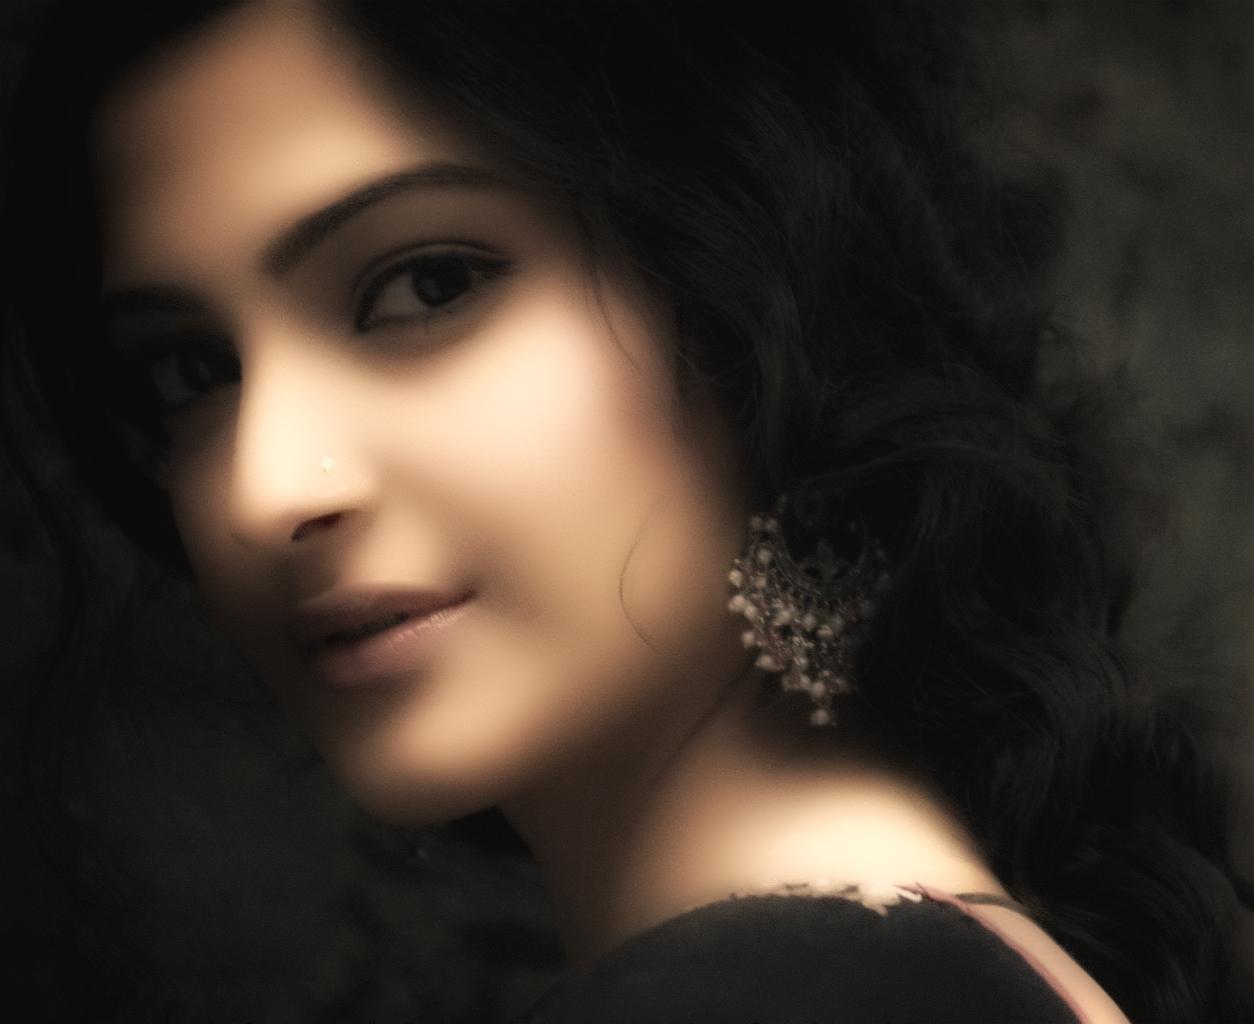 Sonam Kapoor: Sonam Kapoor HD Images